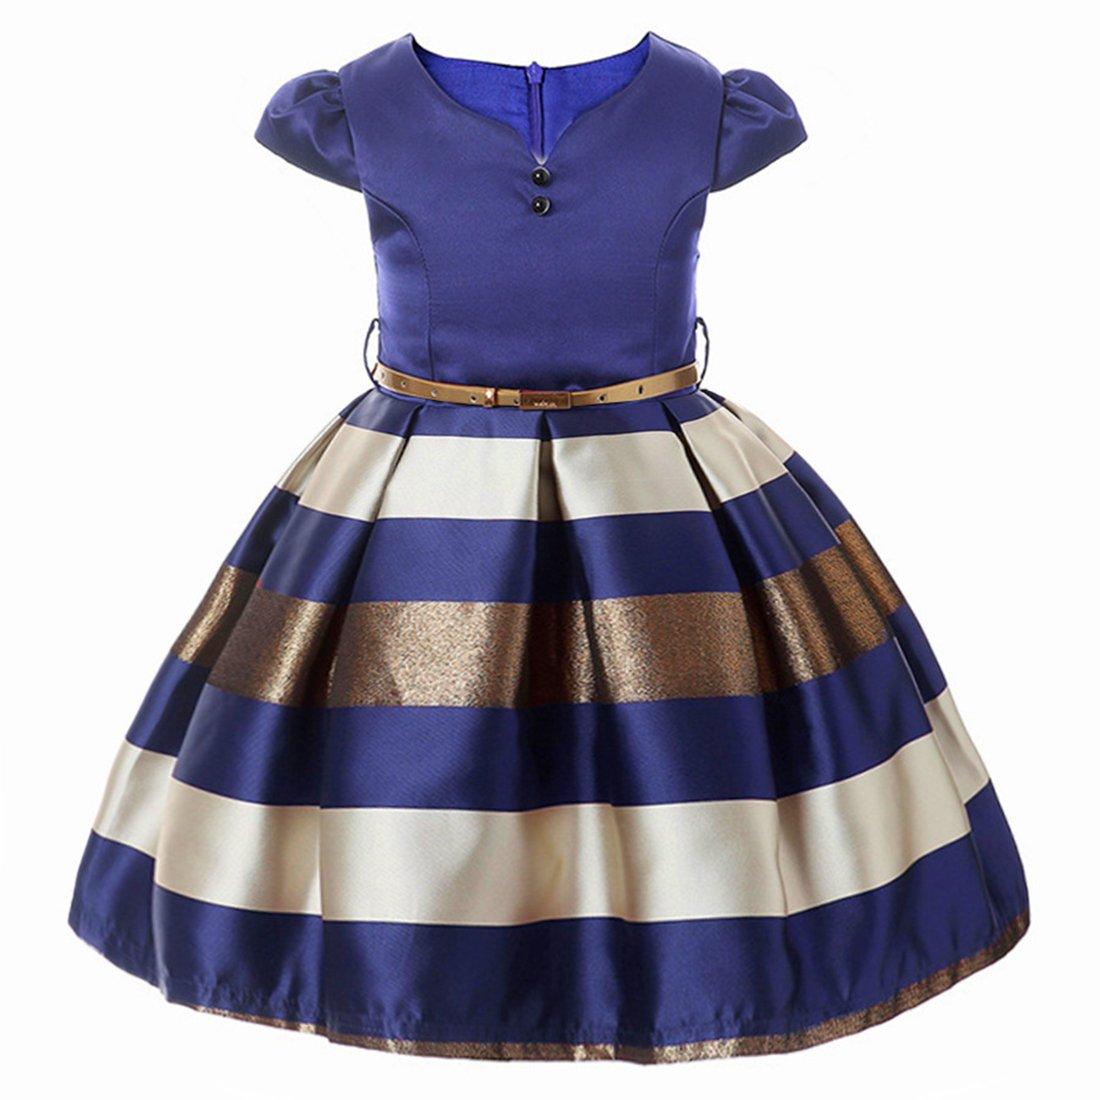 ADHS - de Vestido de B01K3K9SPO fiesta para niñas, vestidos de niñas ...